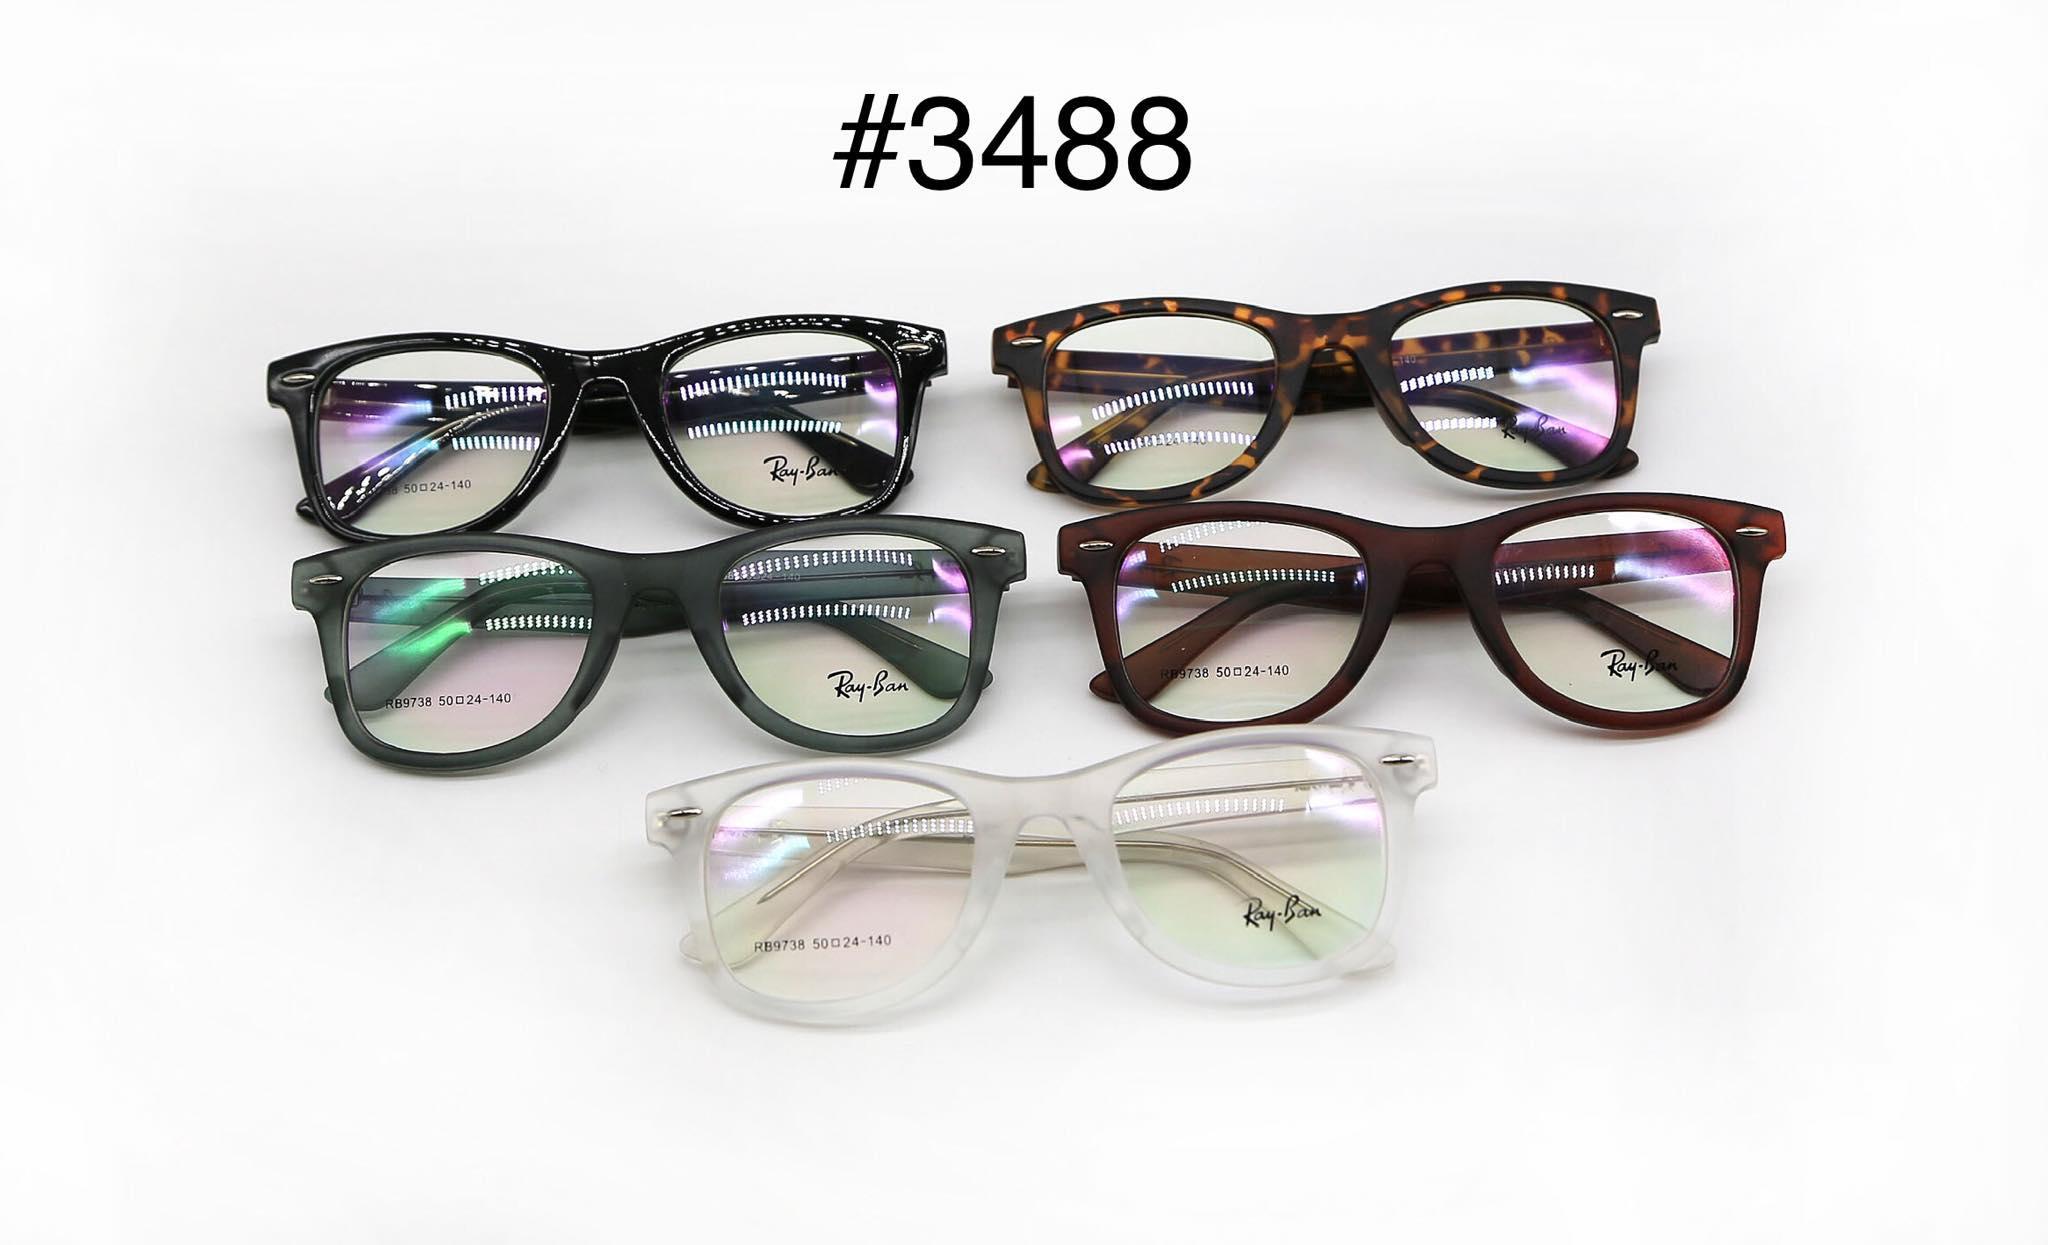 e7505d7cc4a7 Eyeglasses for sale - Reading Glasses online brands, prices ...